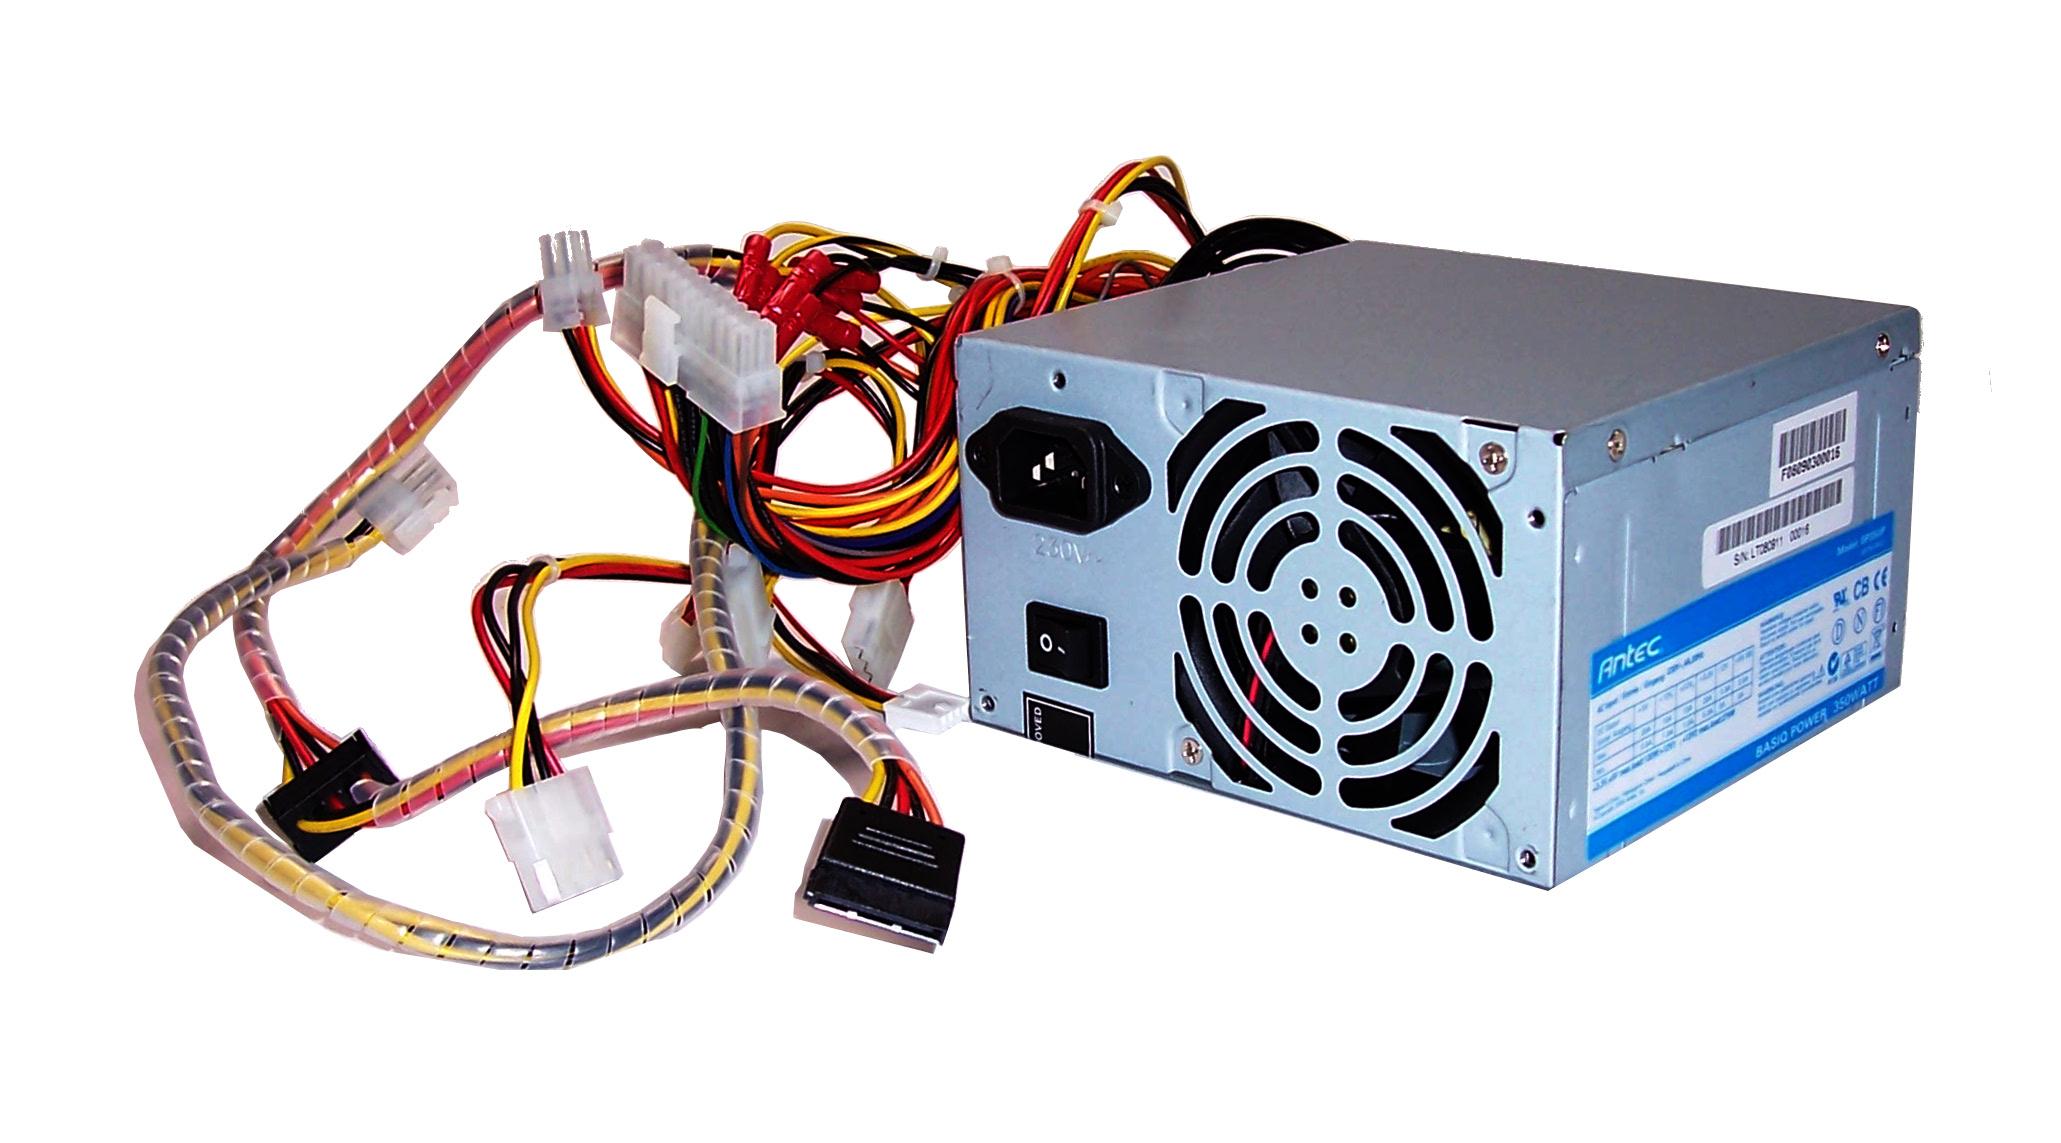 Antec BP350P 350W ATX Basiq 20-Pin Power Supply With PFC